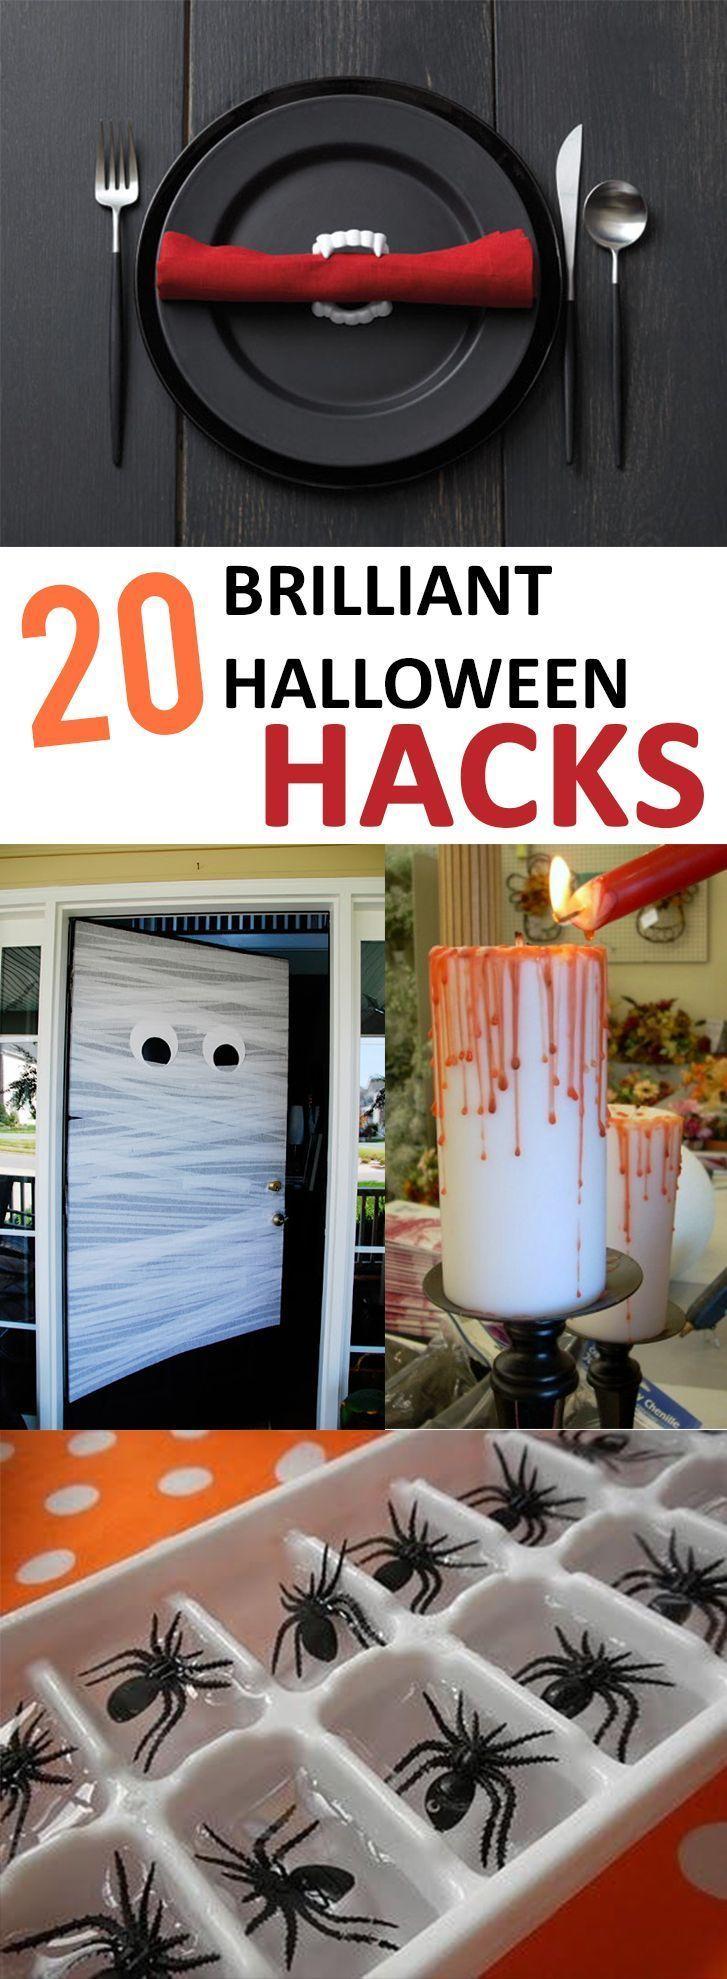 best halloween images on pinterest halloween stuff halloween